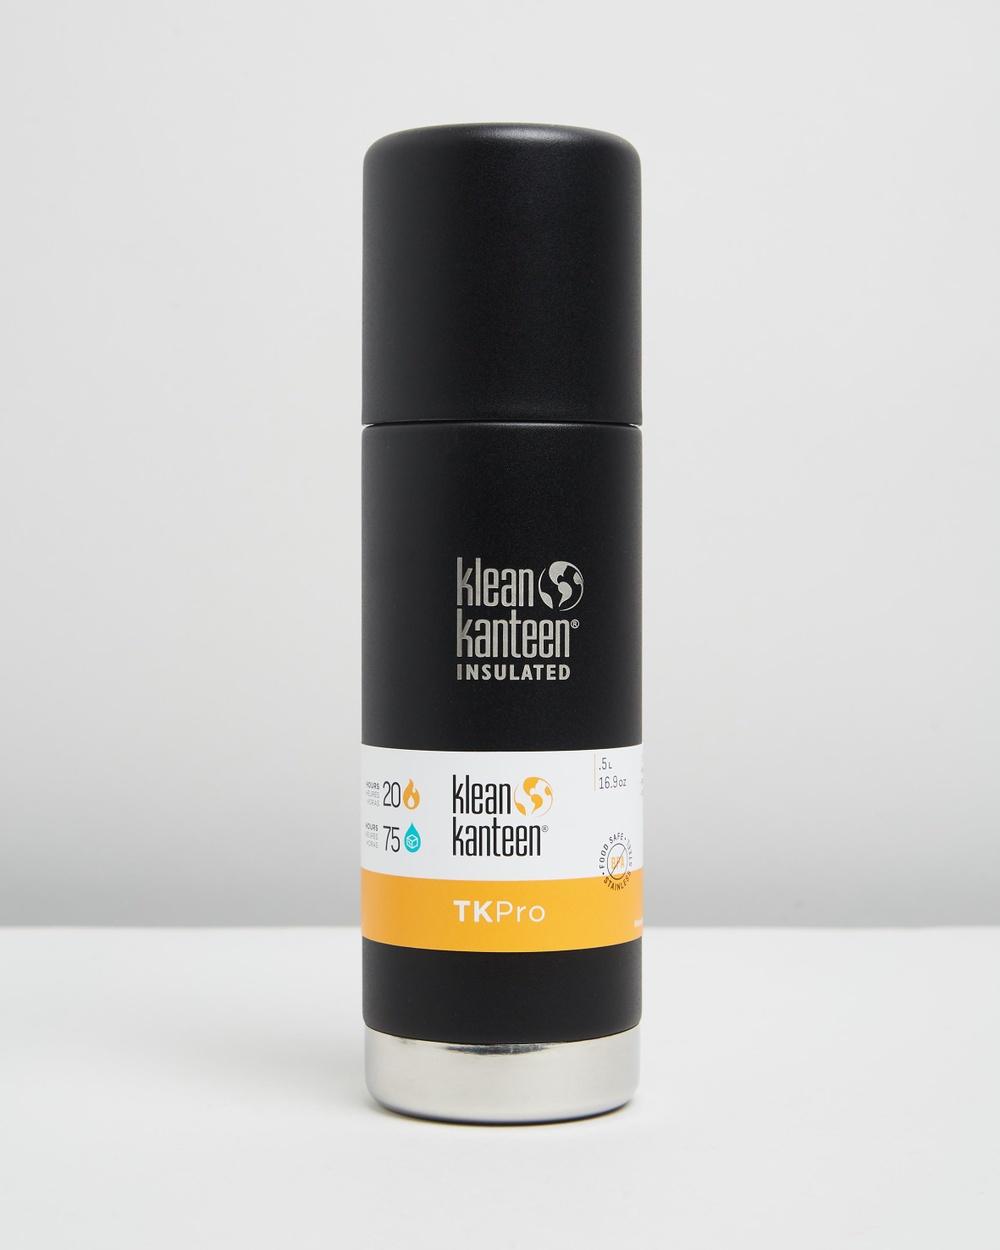 Klean Kanteen TKPro Insulated 500ml Bottle Water Bottles Shale Black